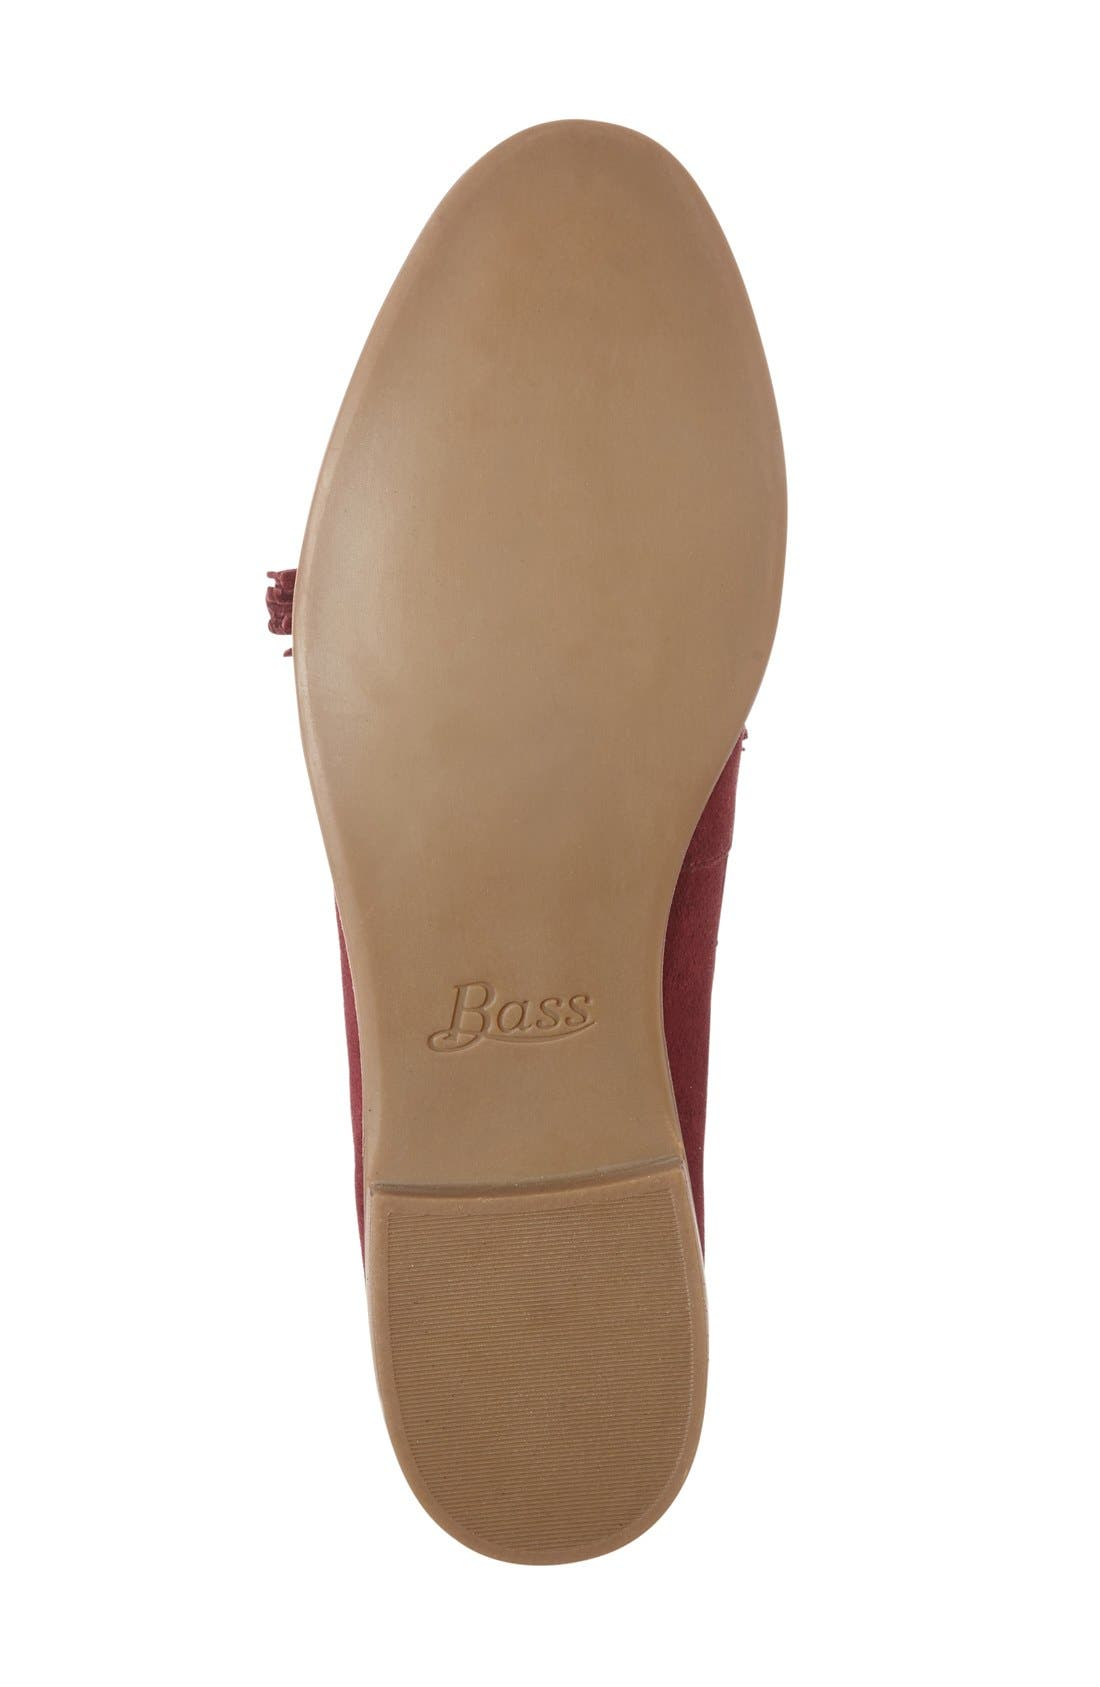 'Estelle' Tassel Loafer,                             Alternate thumbnail 4, color,                             Cherry Red Suede